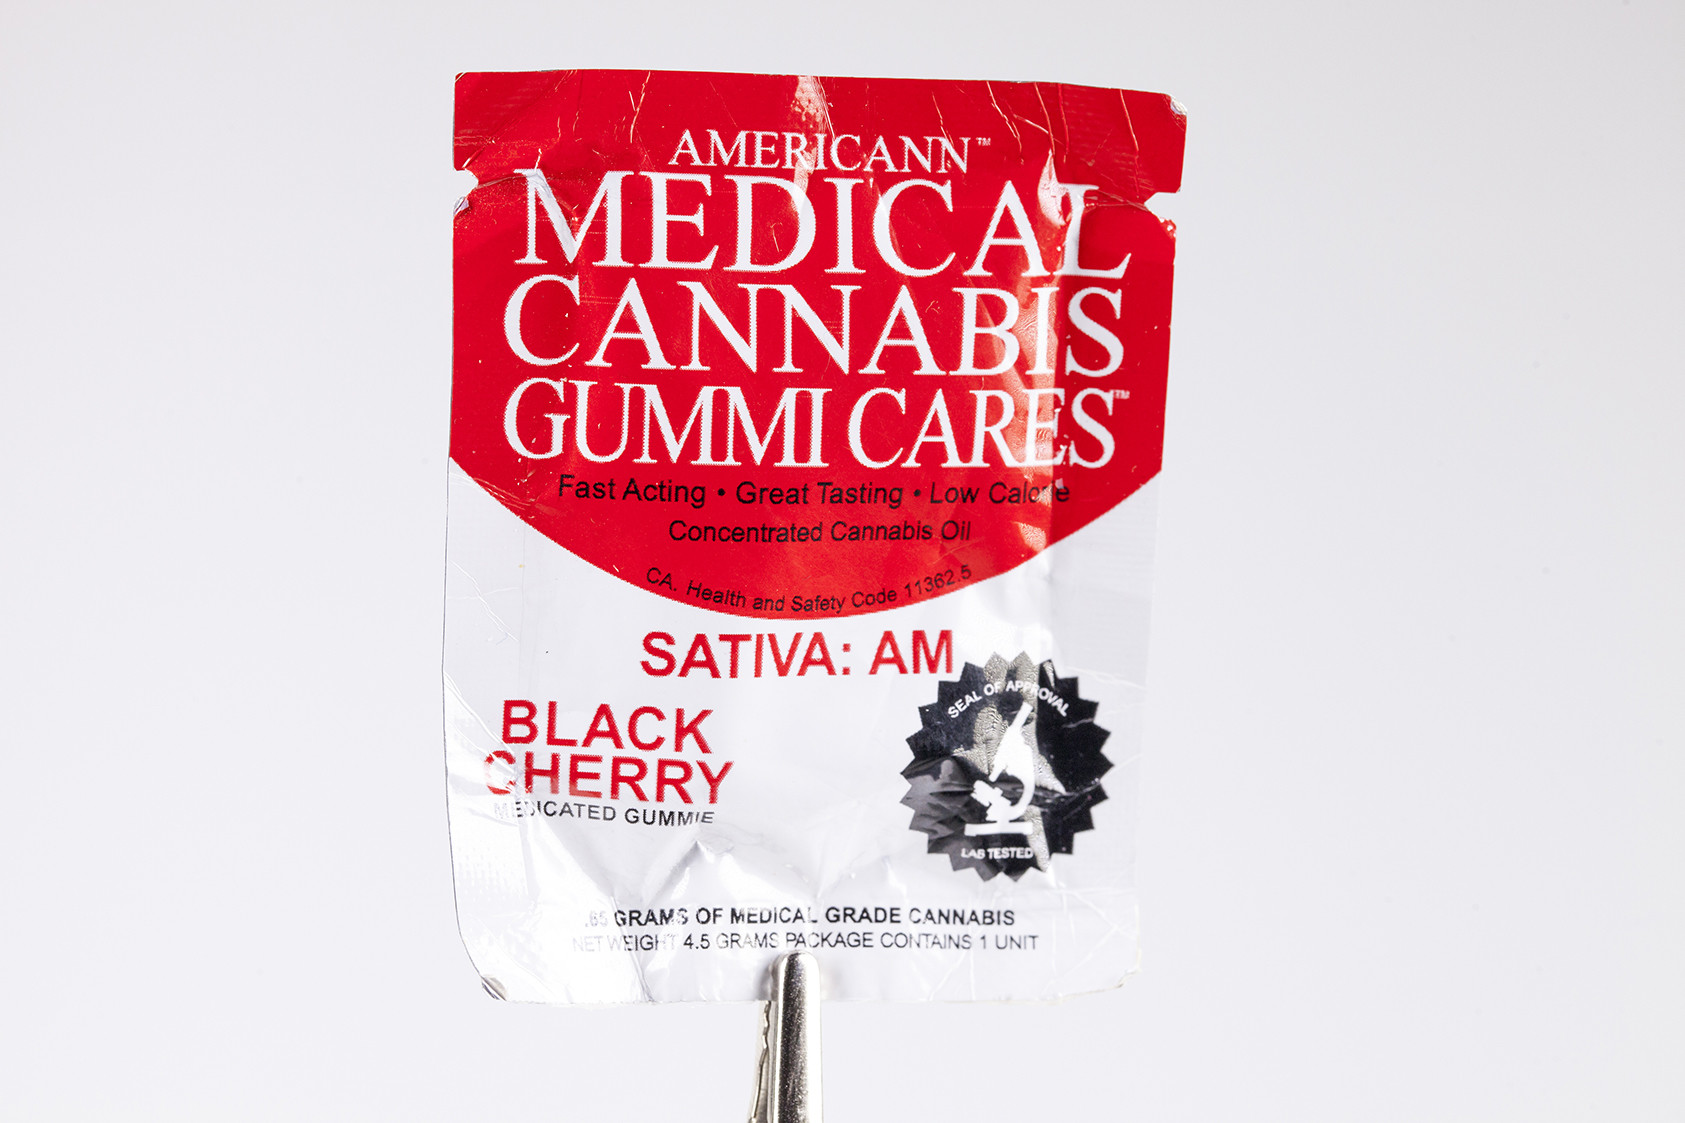 Americann Medicated Gummi Cares